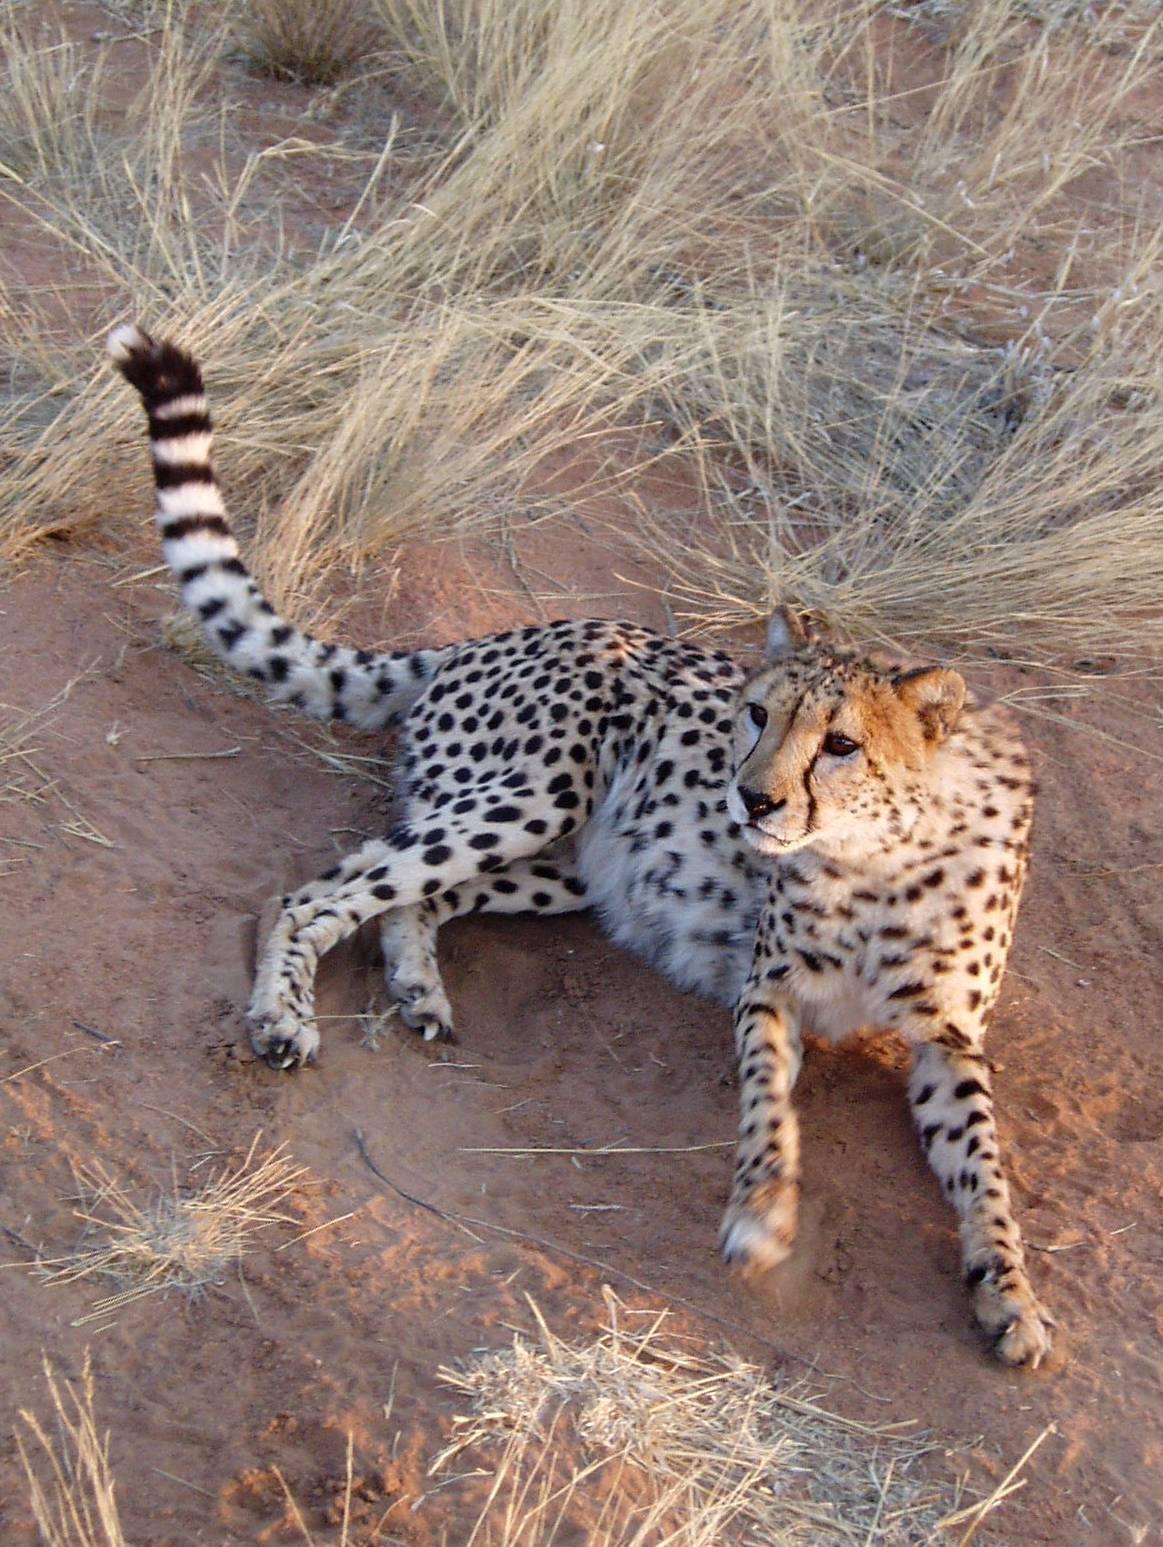 Cheetah lying on the ground